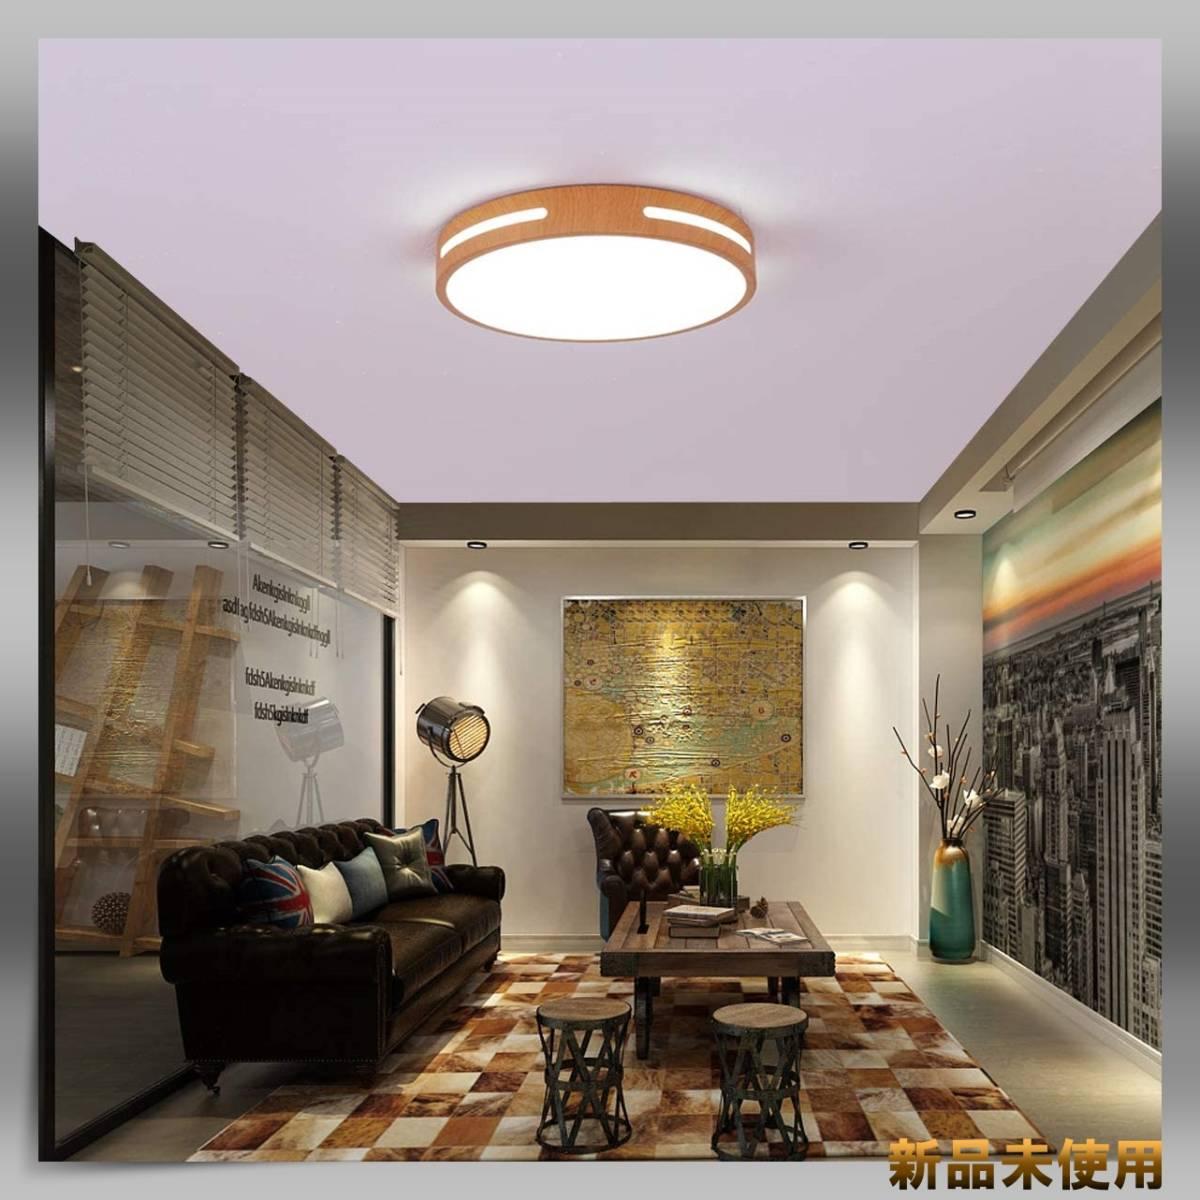 LEDシーリングライト 30W 天井照明器具 木目調 和風 薄型 シーリングライト 無段階調光調色 リモコン付き_画像8